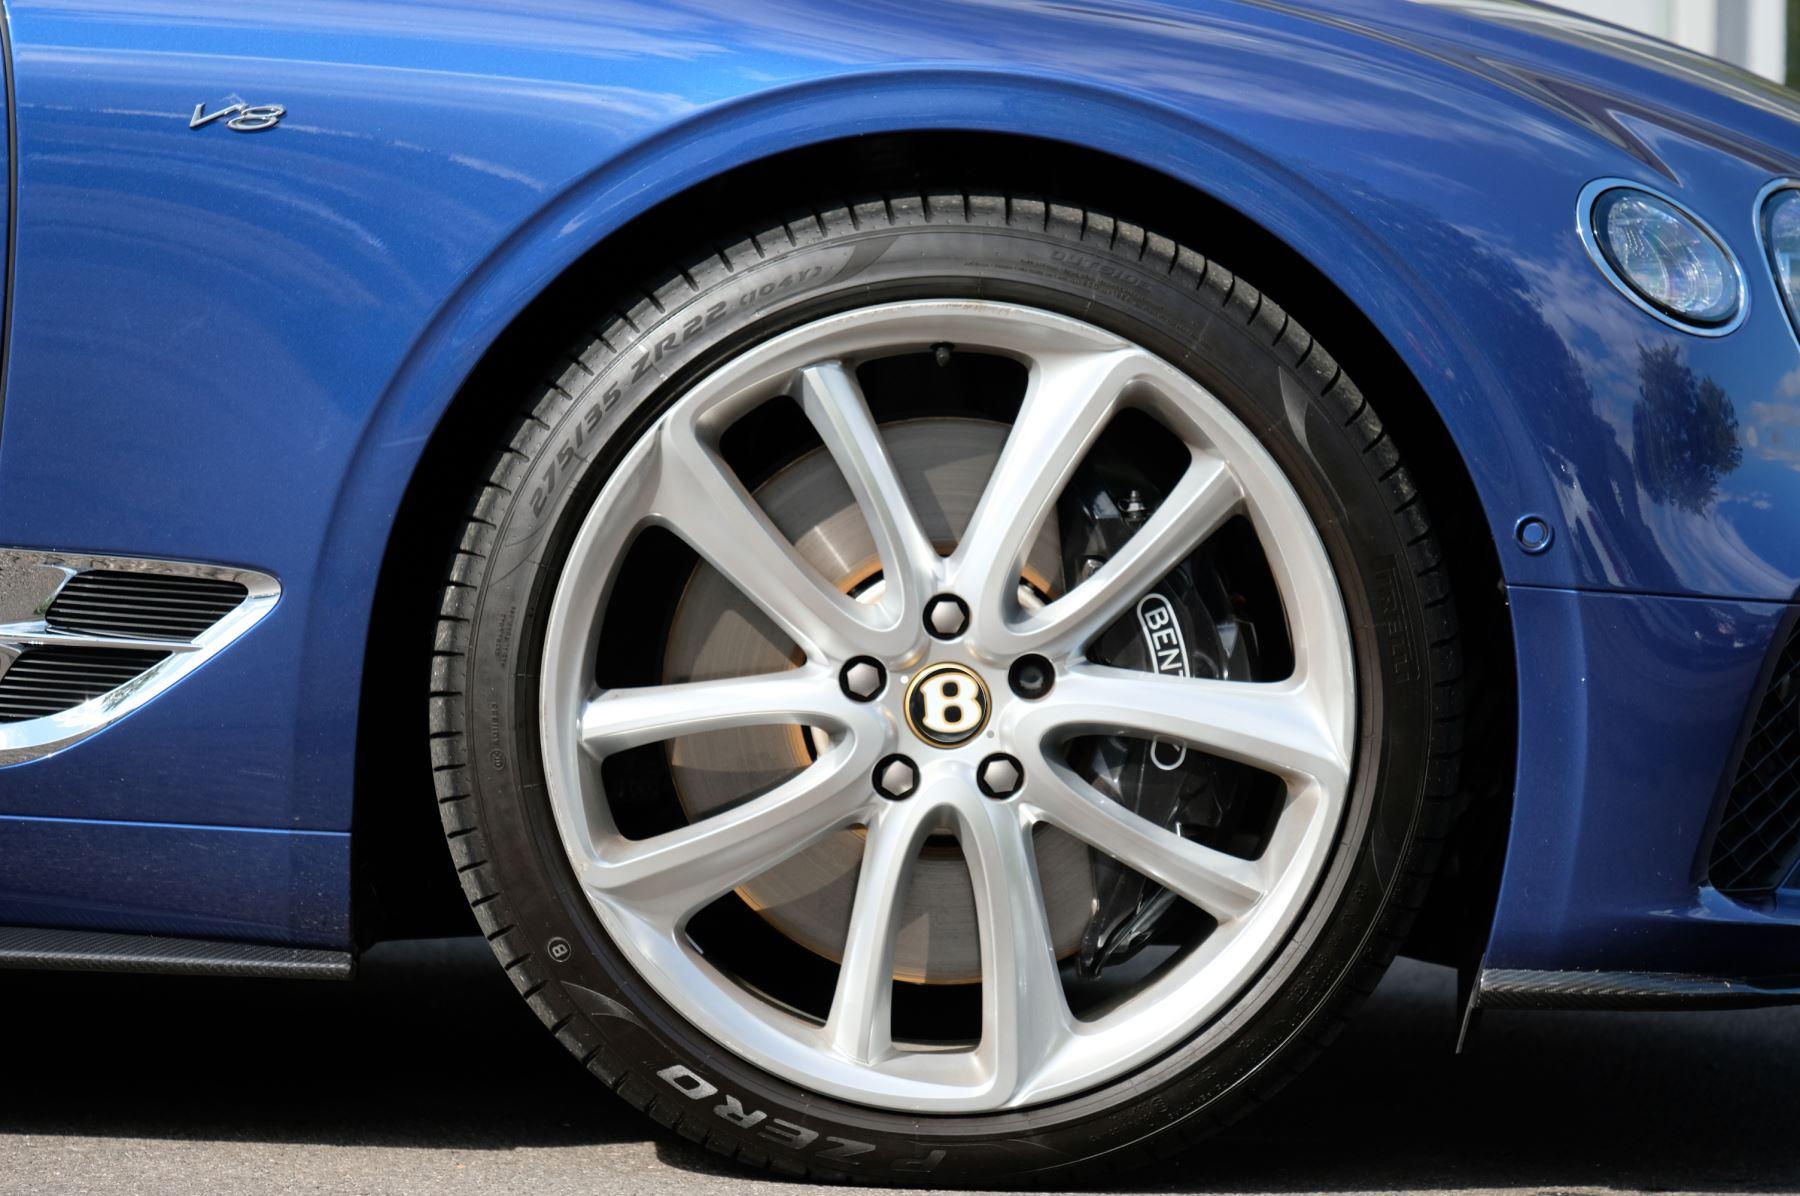 Bentley Continental GT 4.0 V8 2dr Mulliner Driving Specification image 10